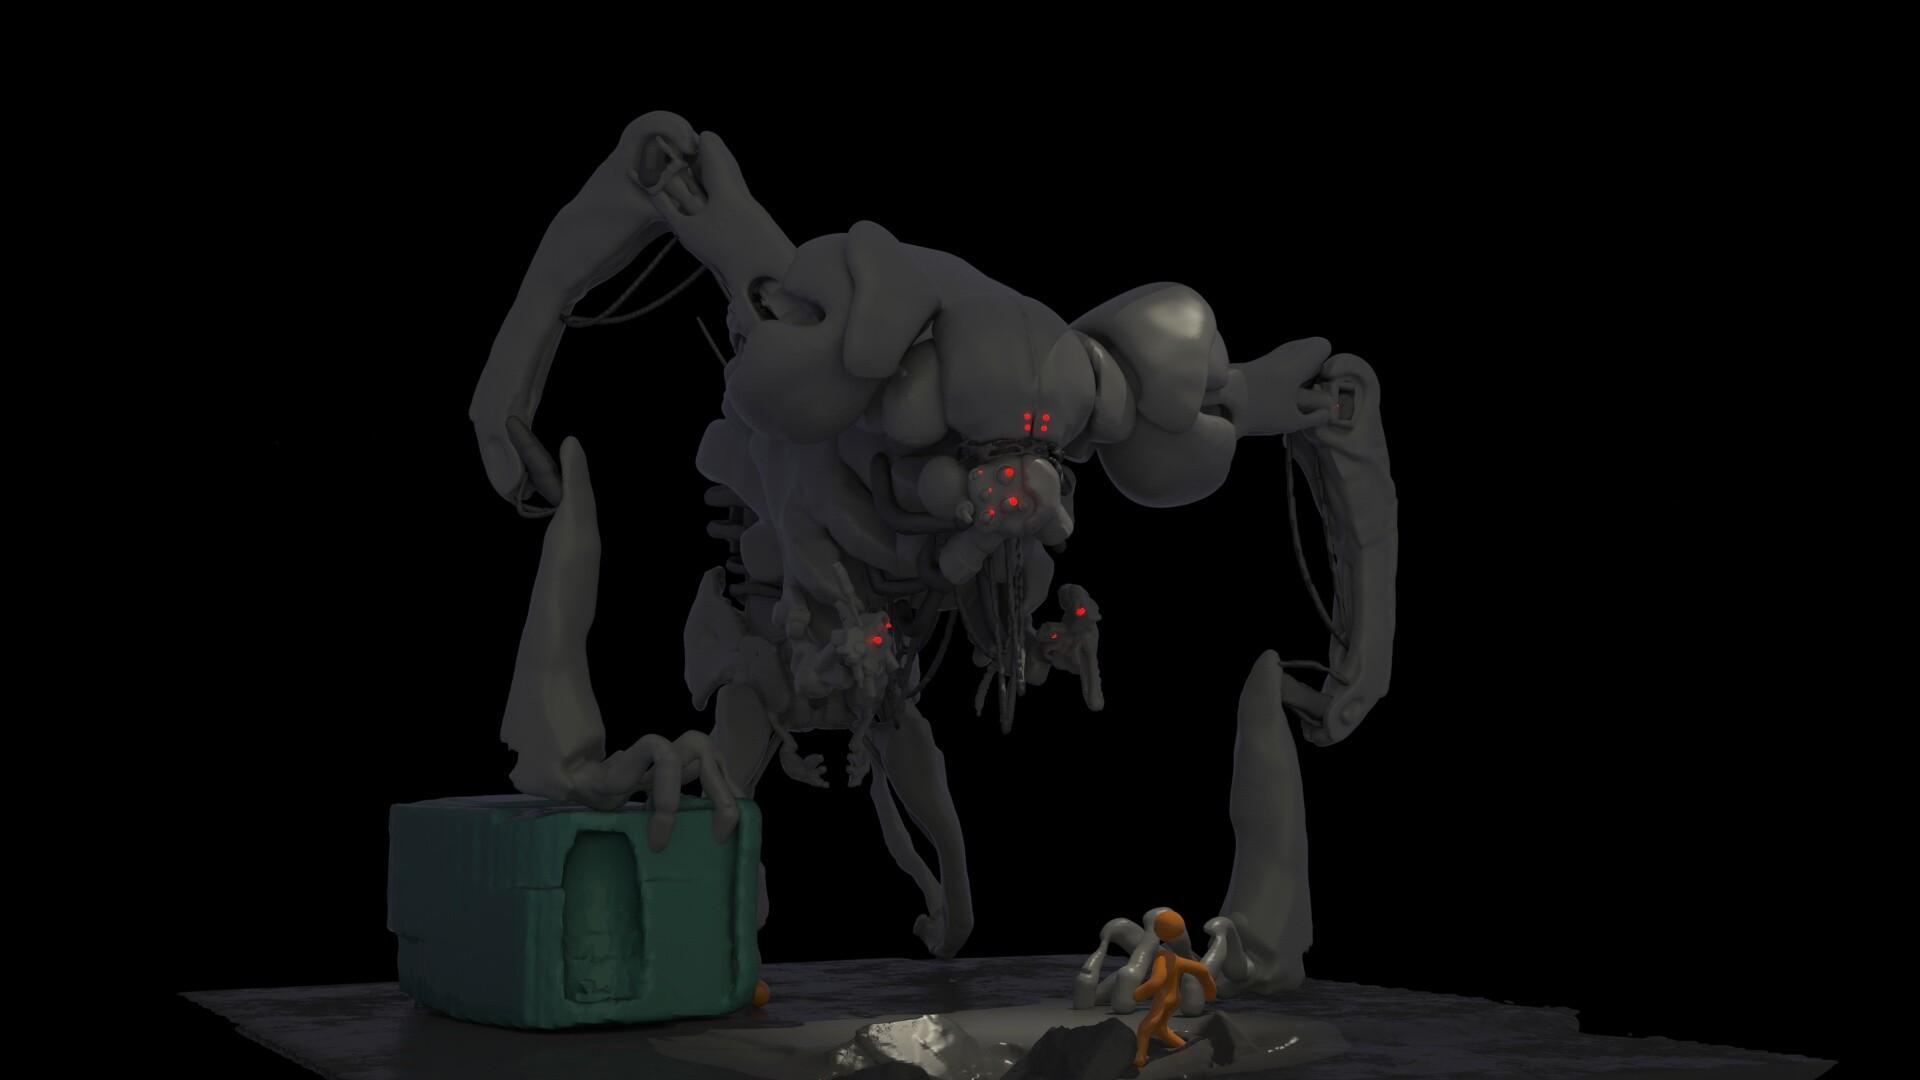 Digital Sculpture by Marcelo Pasqua